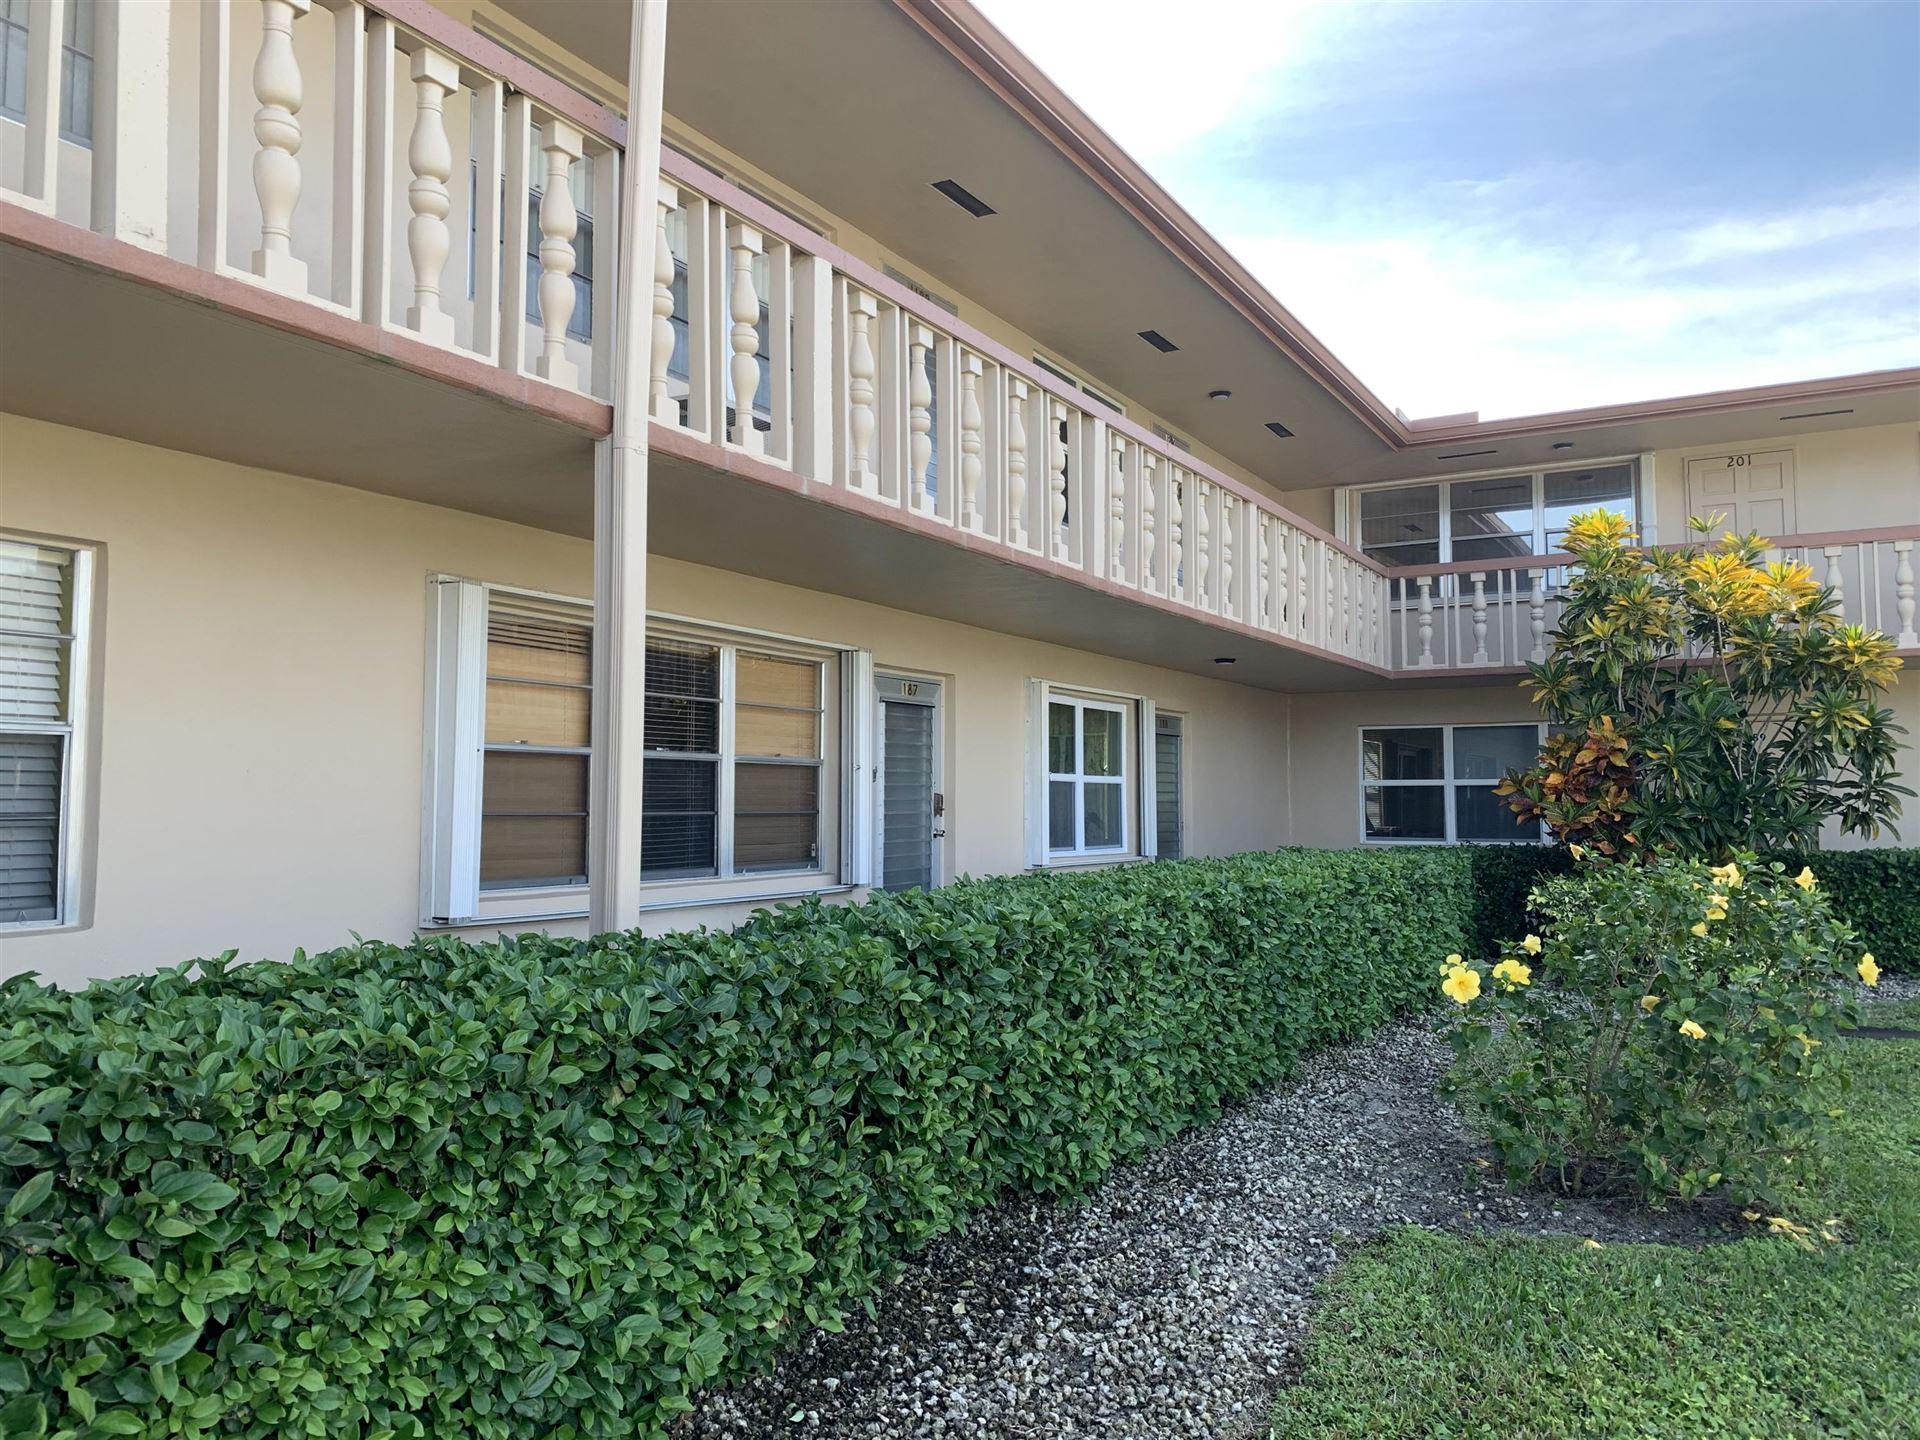 187 Northampton J, West Palm Beach, FL 33417 - MLS#: RX-10691344